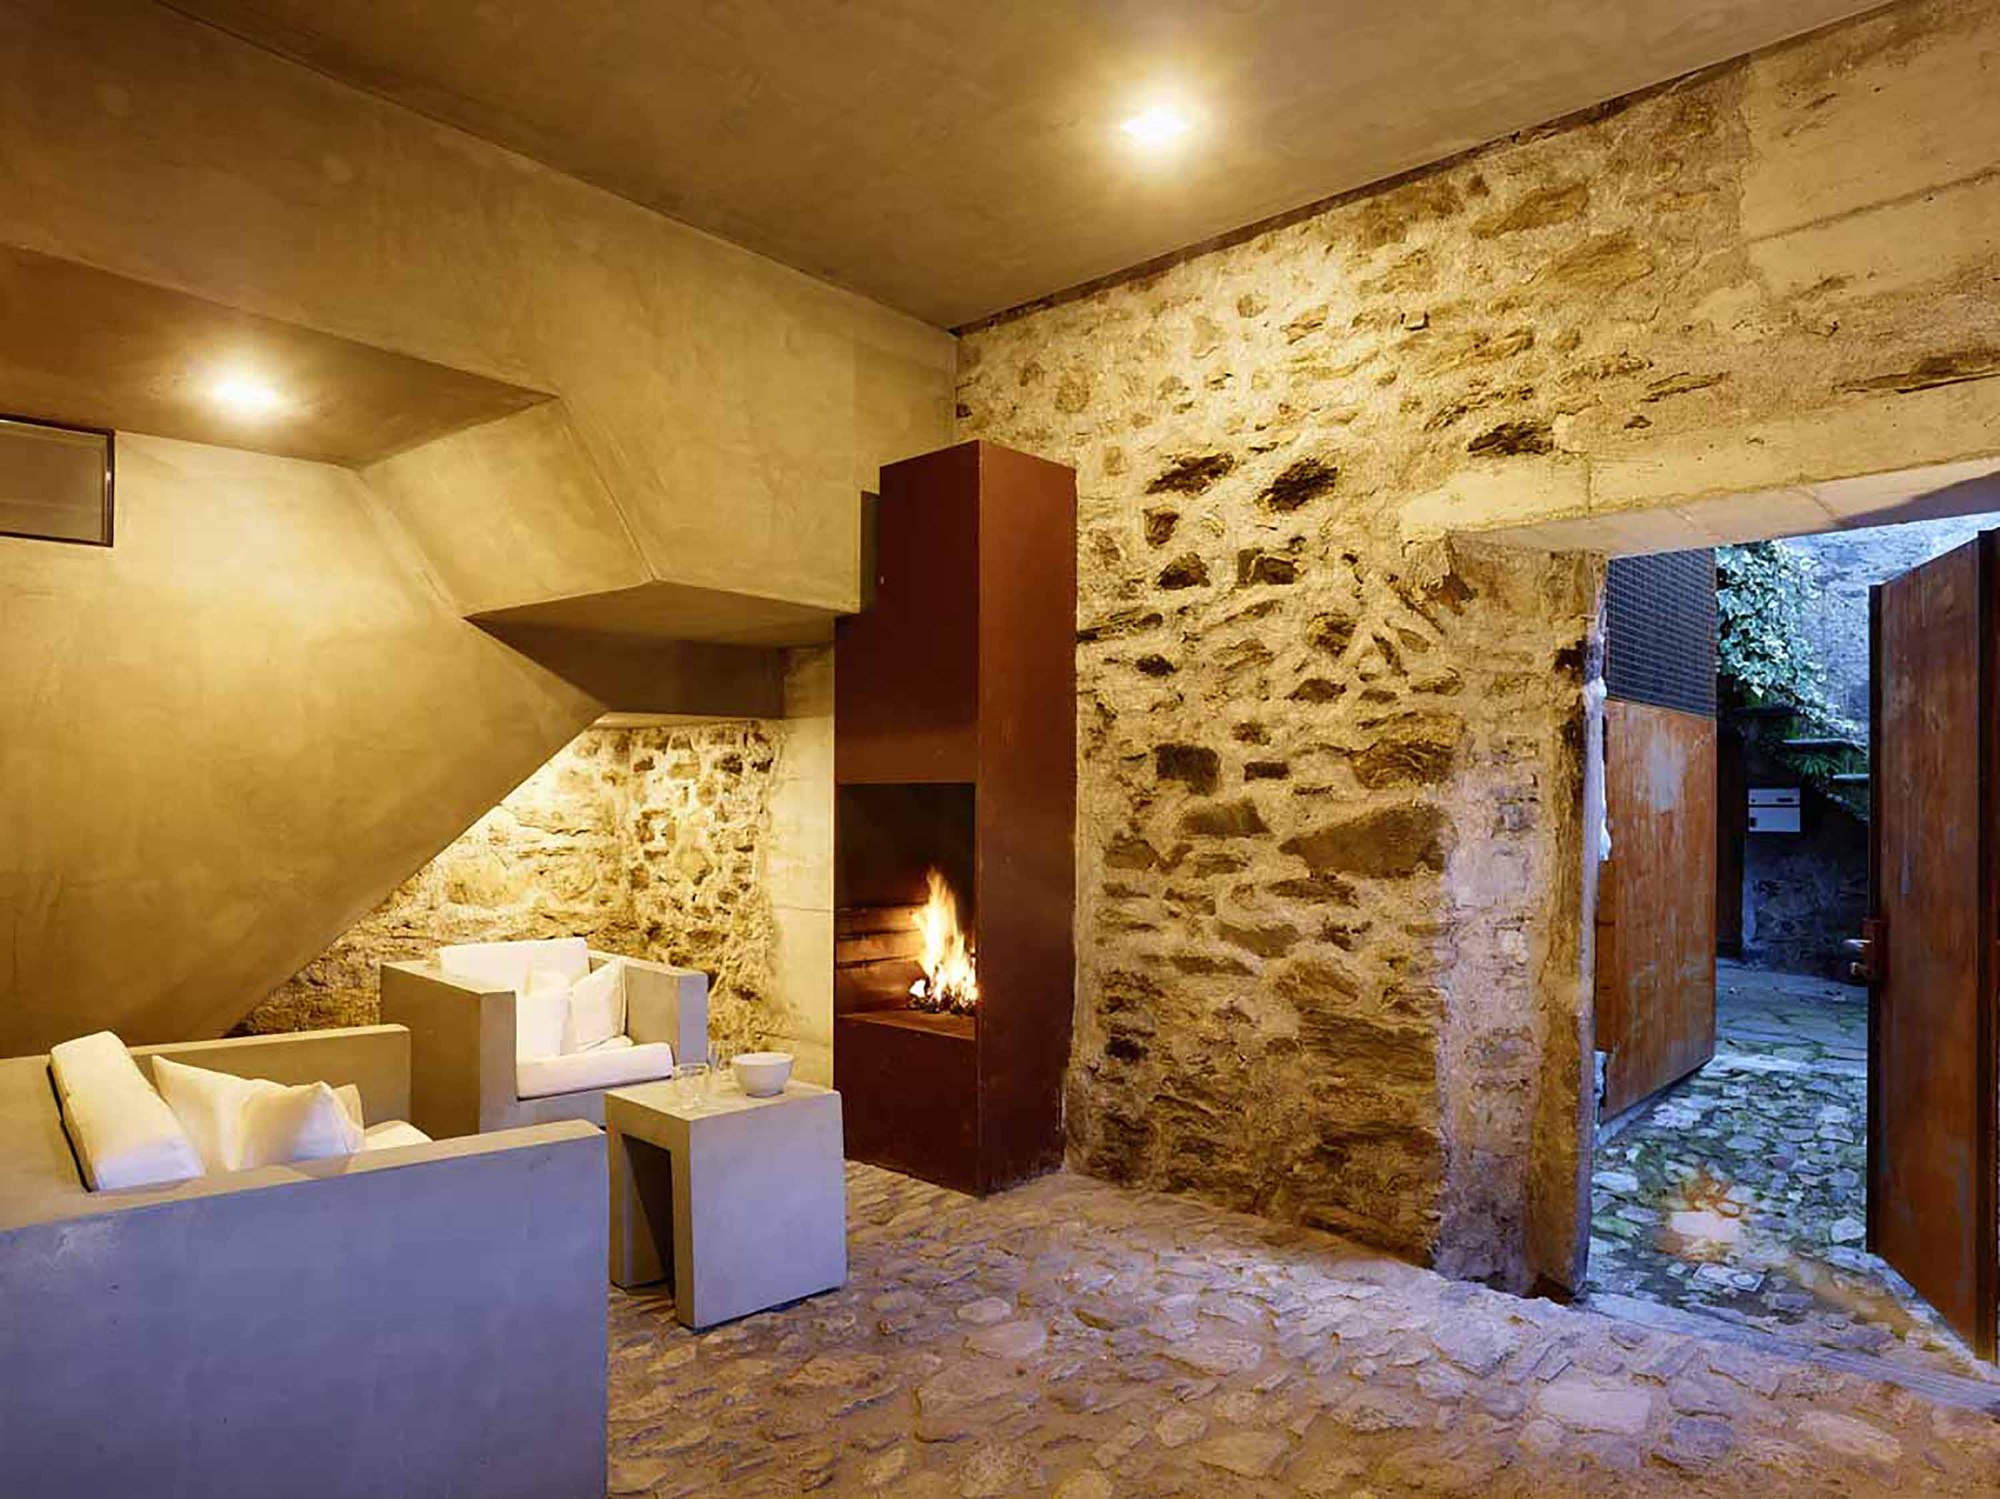 543dd609c07a802a69000259_stone-house-transformation-in-scaiano-wespi-de-meuron-romeo-architects_1430_cf030986.jpg